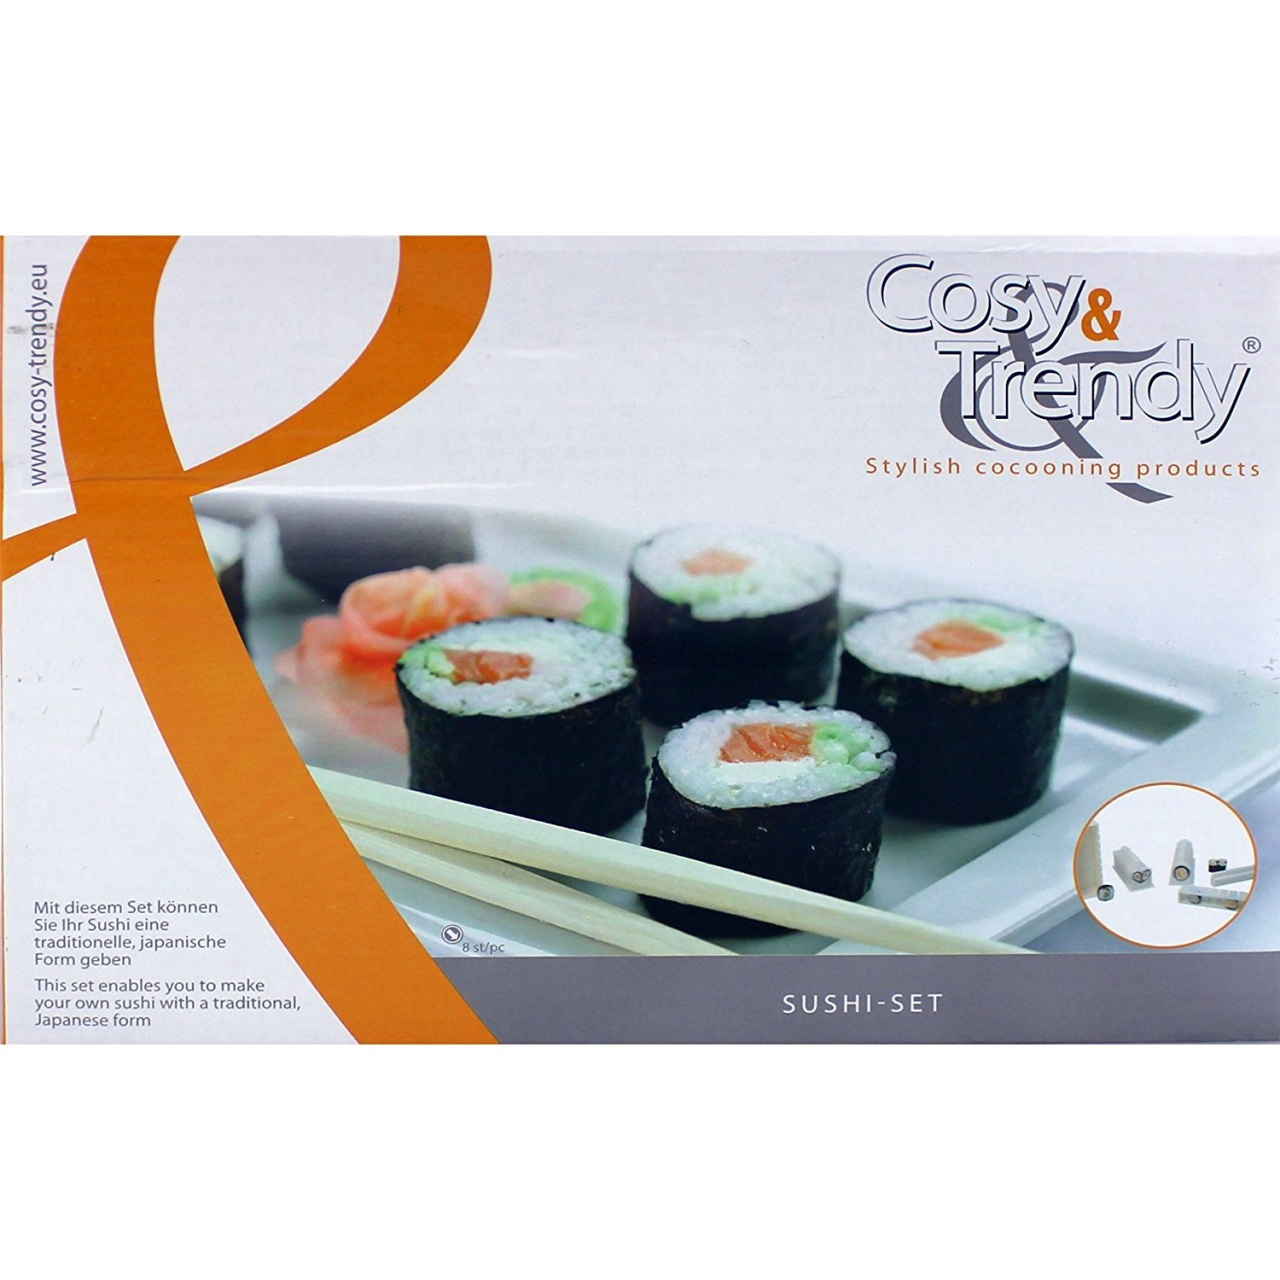 Sushi Set Sushimaker, Sushiroller, Sushiformer